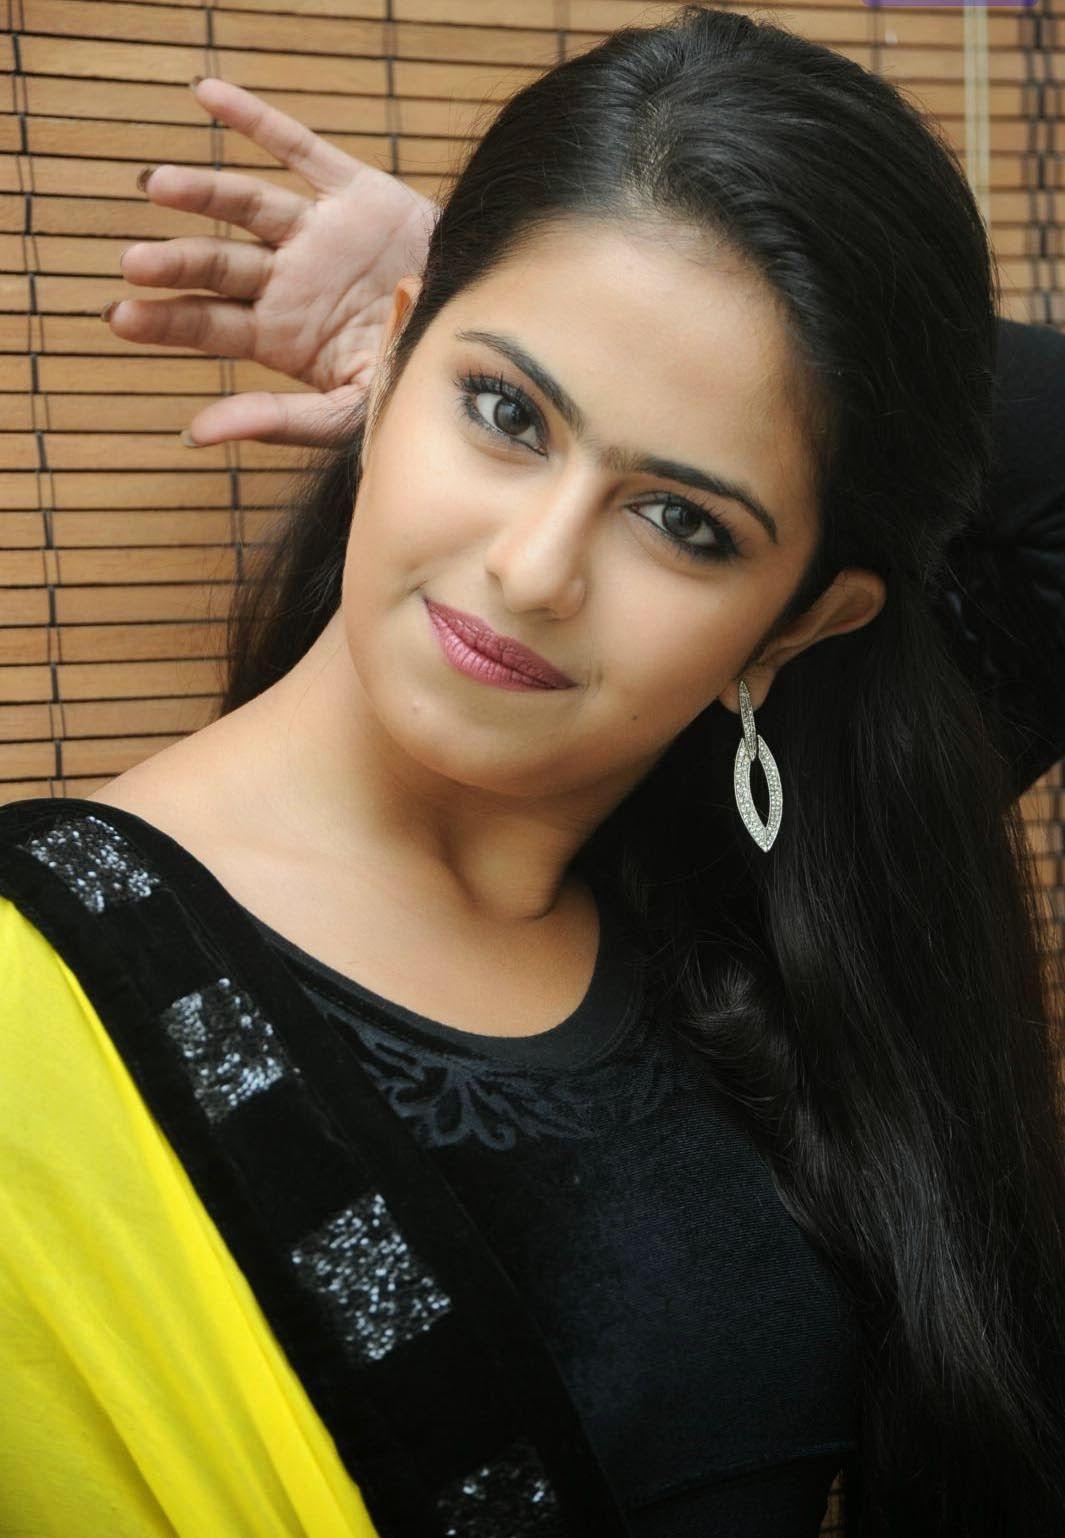 Cinema Actress Telugu Heroines 1065x1538 Download Hd Wallpaper Wallpapertip